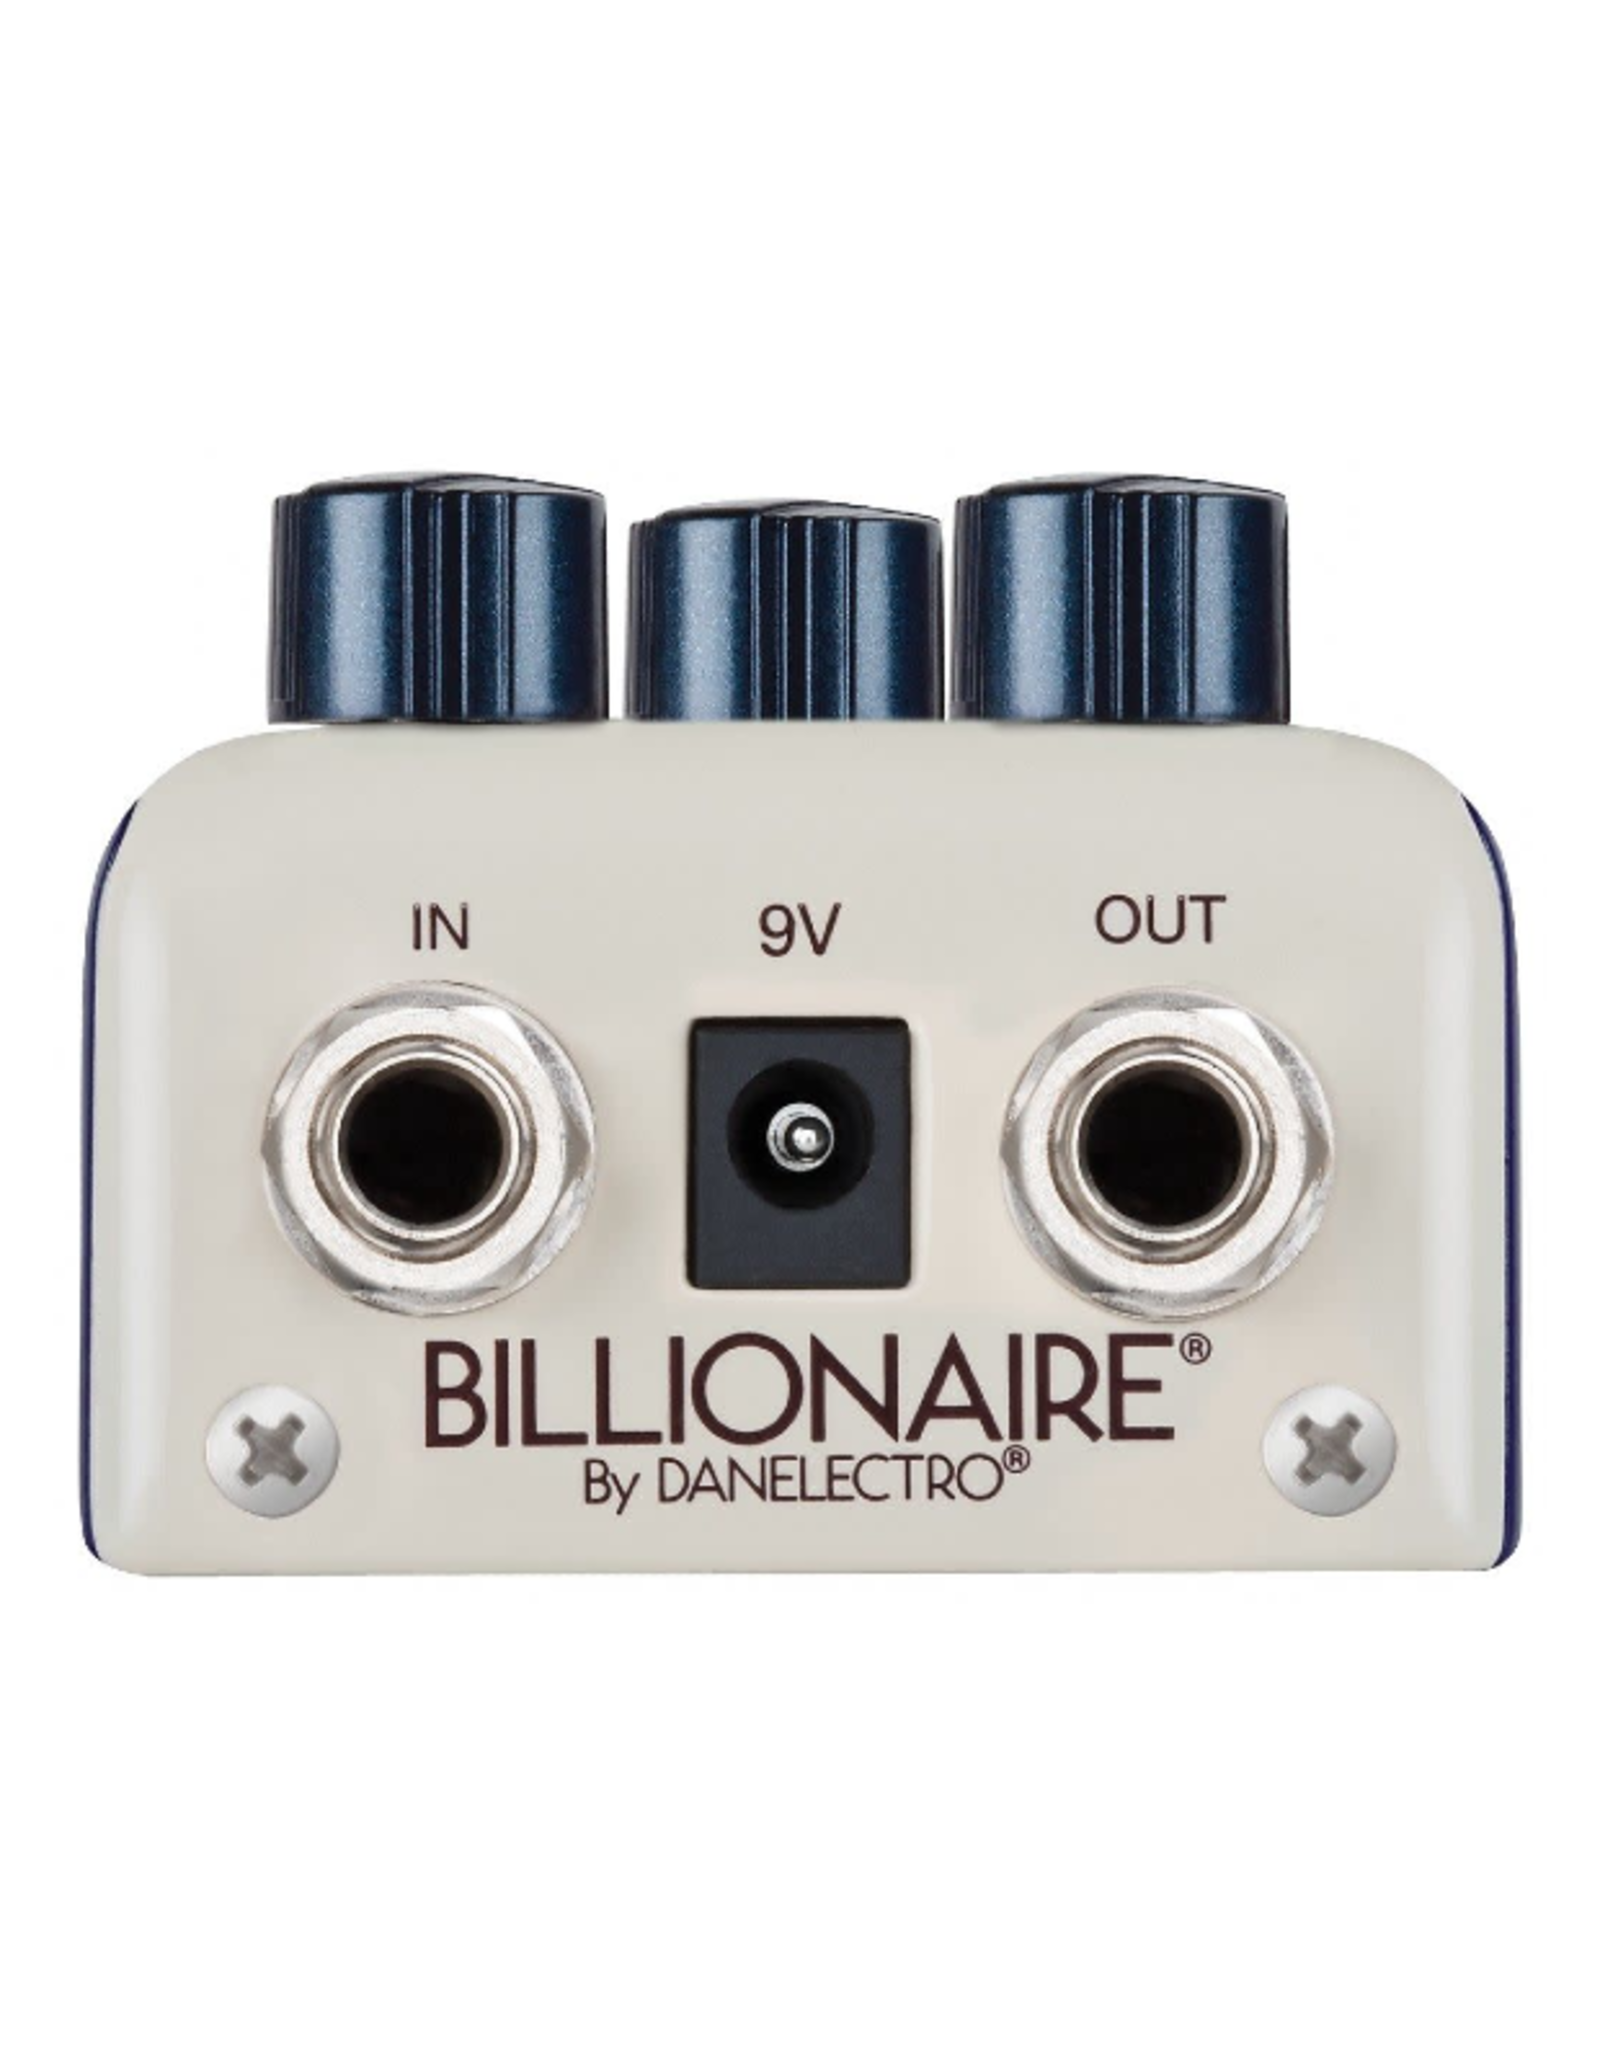 Danelectro Billionaire by Danelectro Billion Dollar Boost